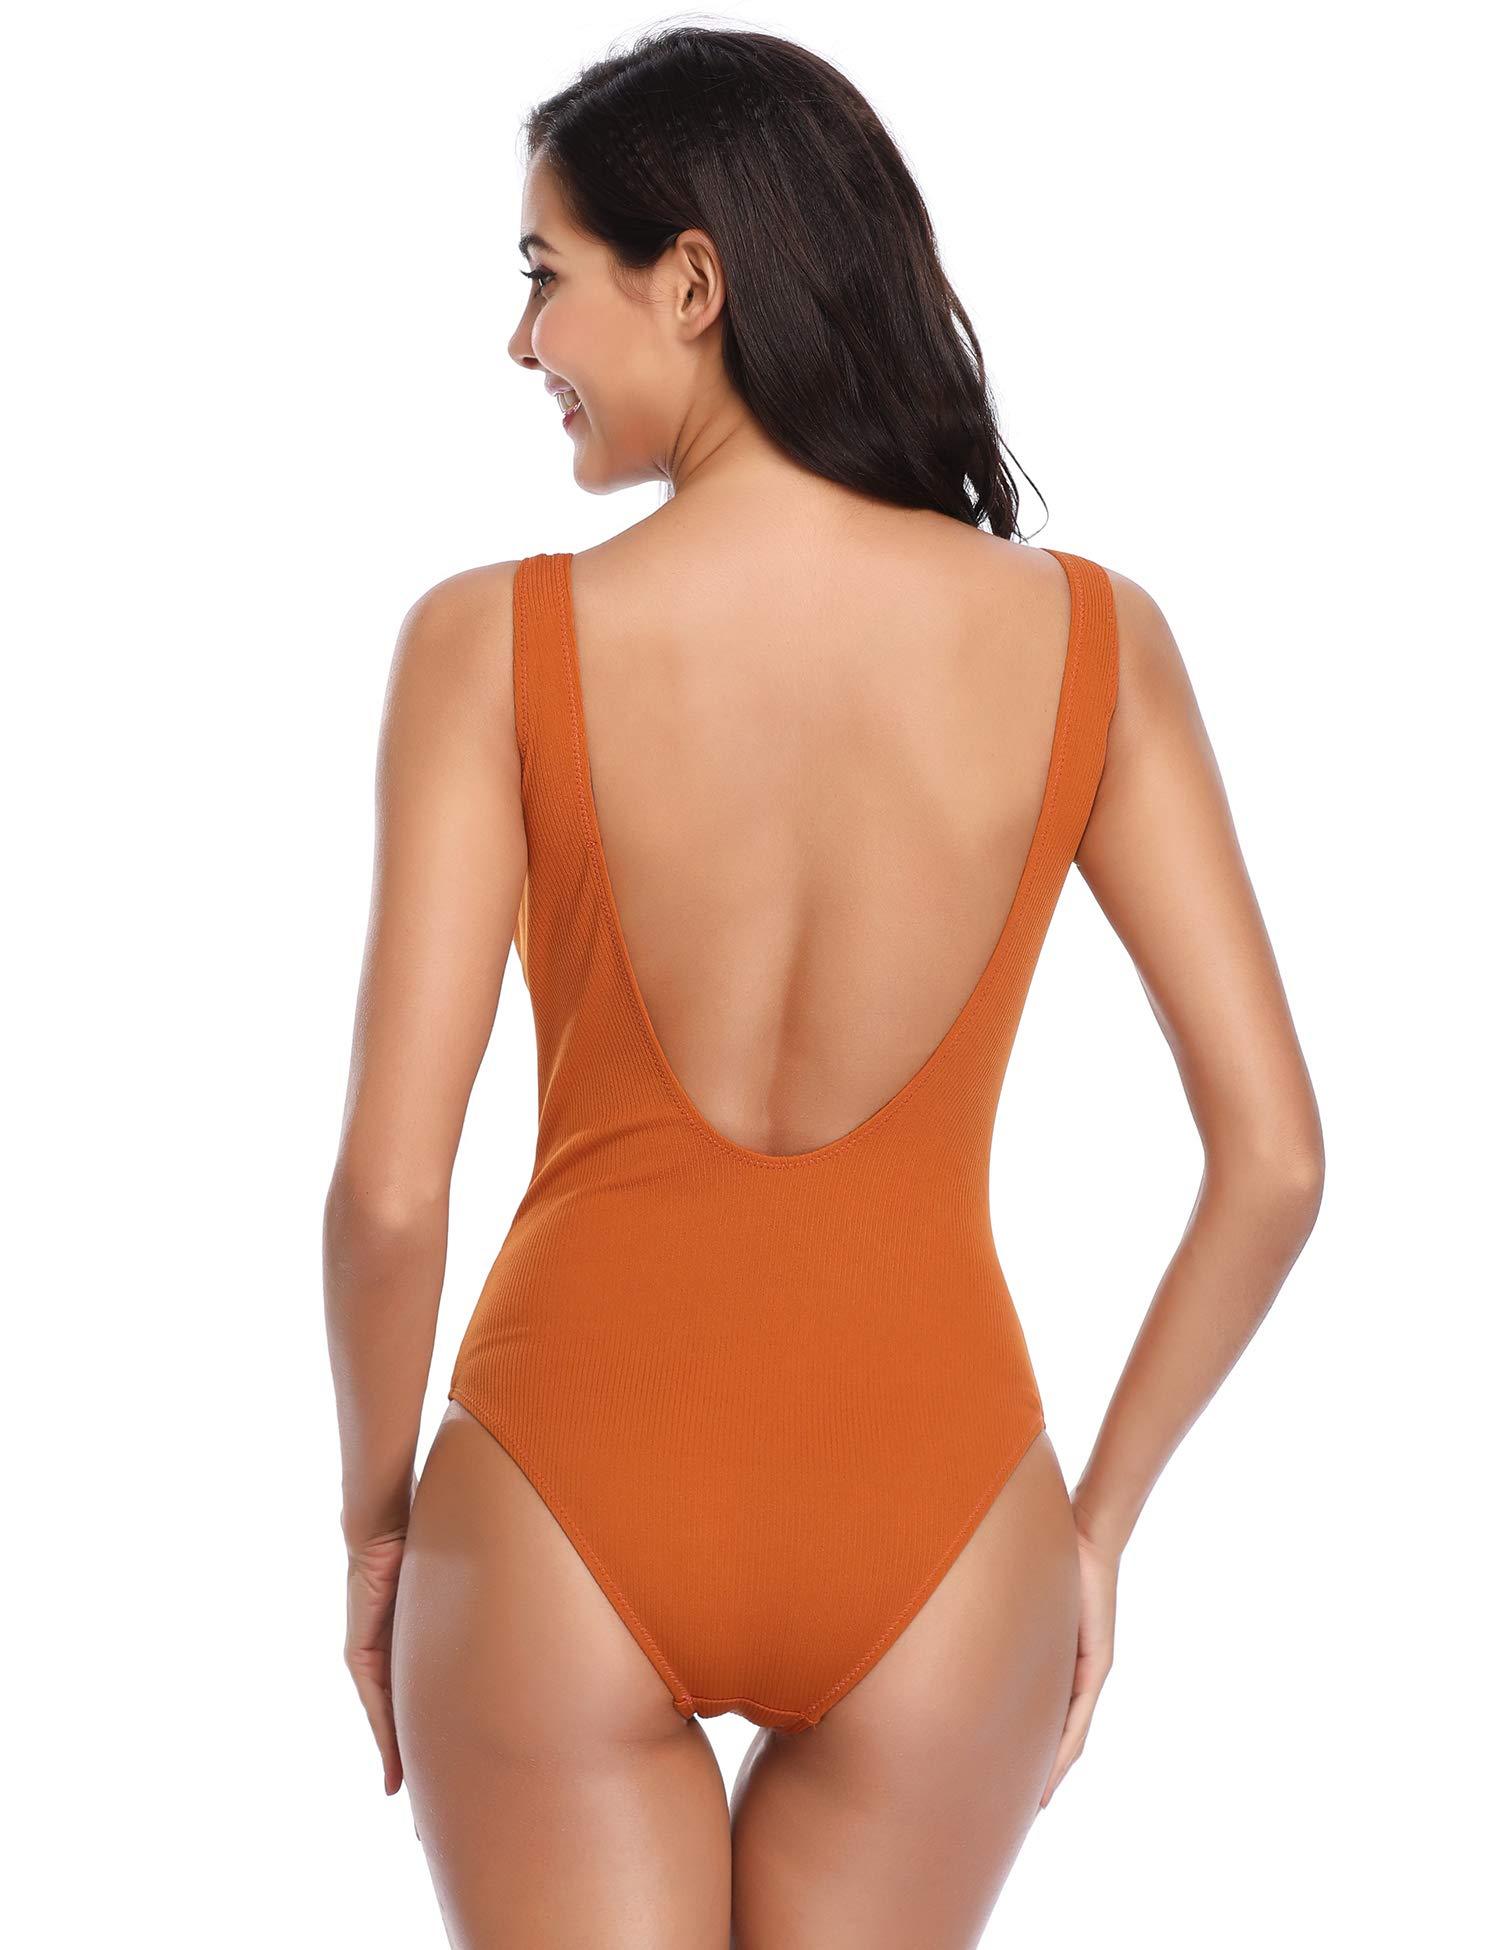 MarianVida Women One Piece Swimsuit Low Cut Back Bathing Suit (Dark-Orange, X-Large)